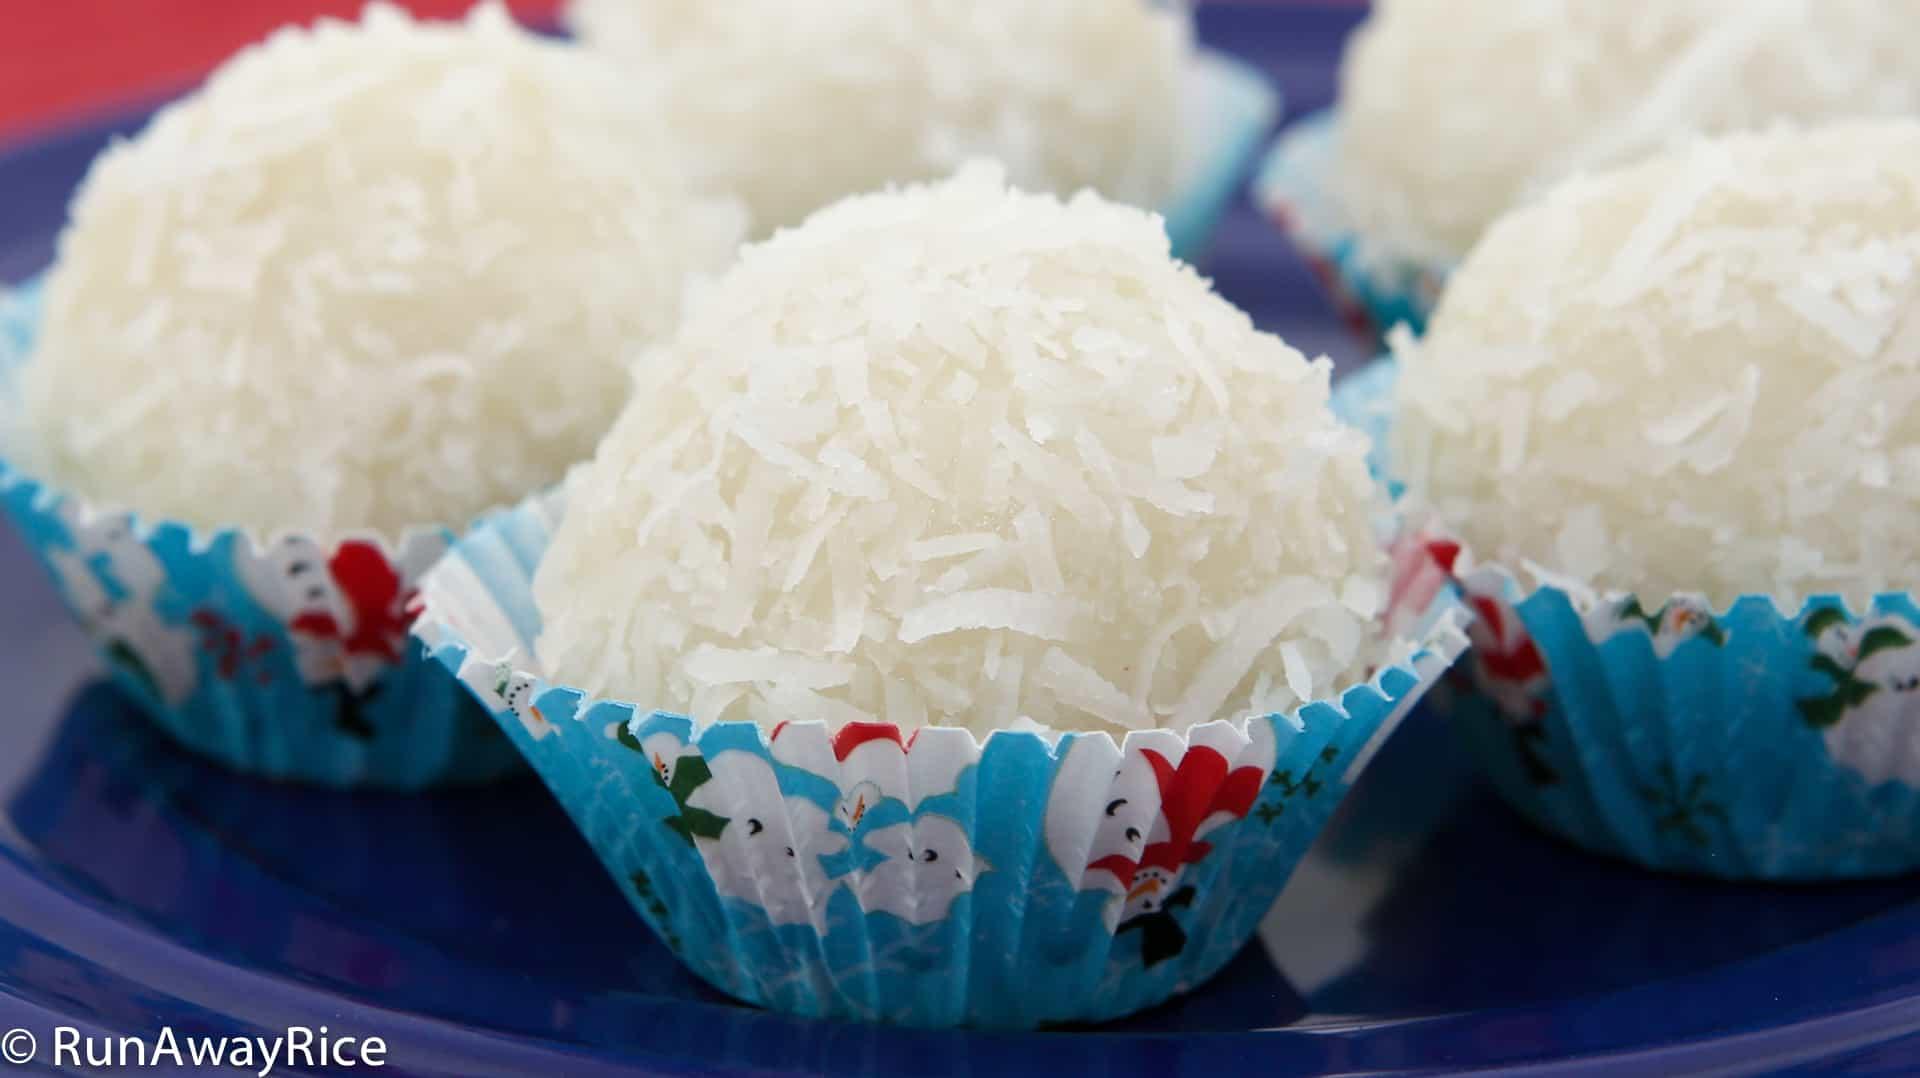 Snowball Cakes / Vietnamese Mochi / Nut-Filled Mochi Cakes / Banh Bao Chi - festive Snowball Cakes, a tasty holiday treat! | recipe from runawayrice.com